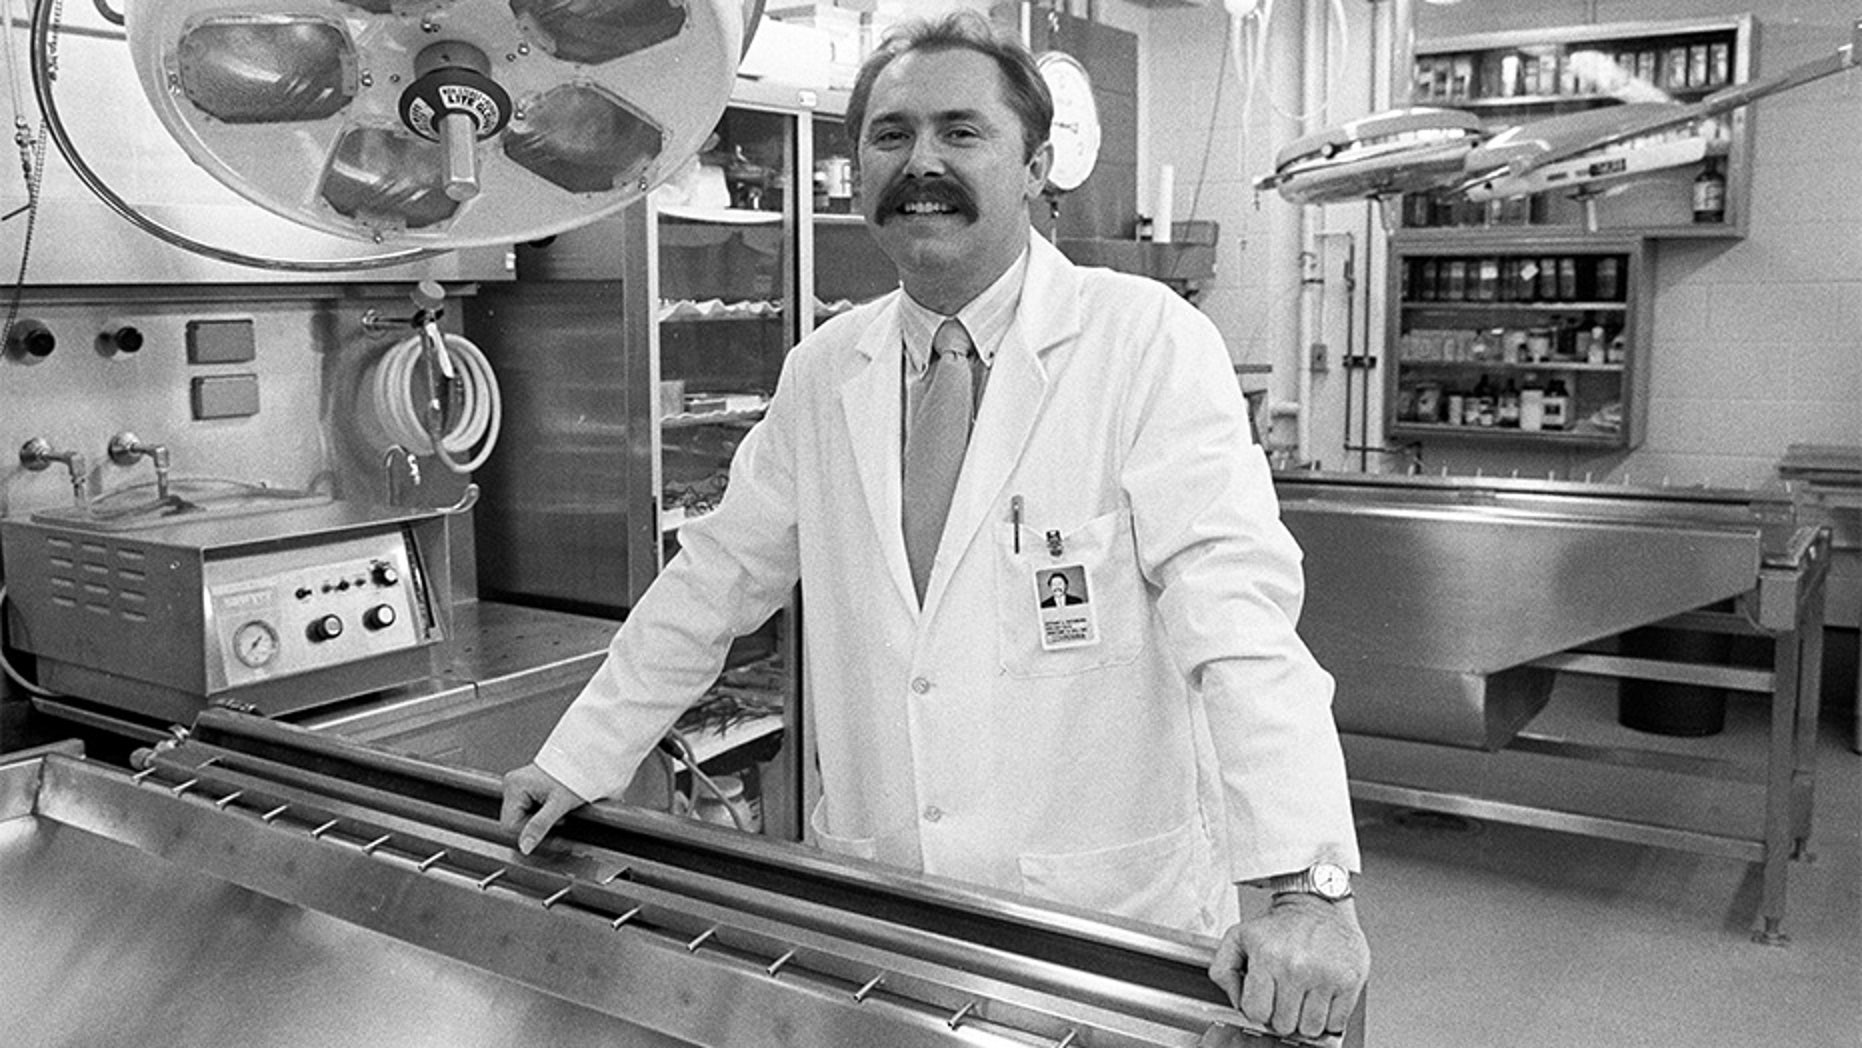 Arthur Rathburn at the University of Michigan in Ann Arbor, Michigan, U.S. in November 1988.